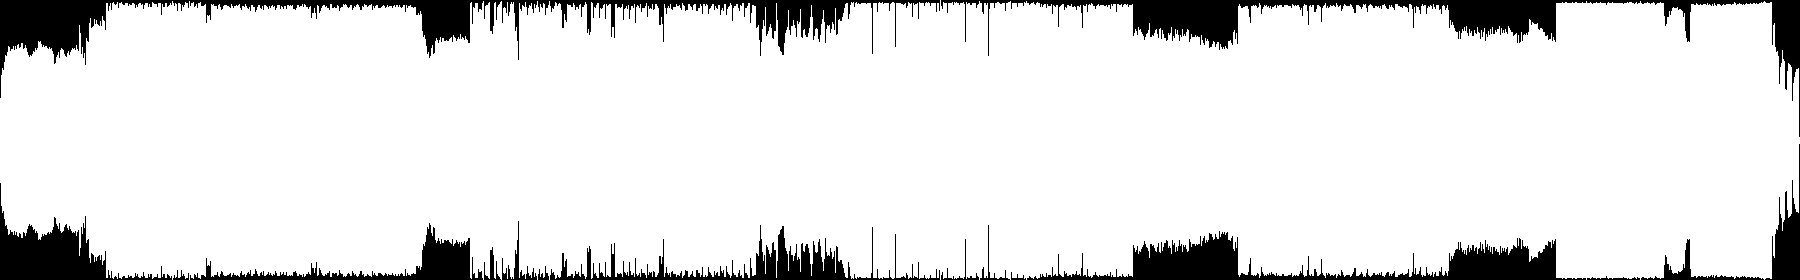 Alt Tec Pop audio waveform